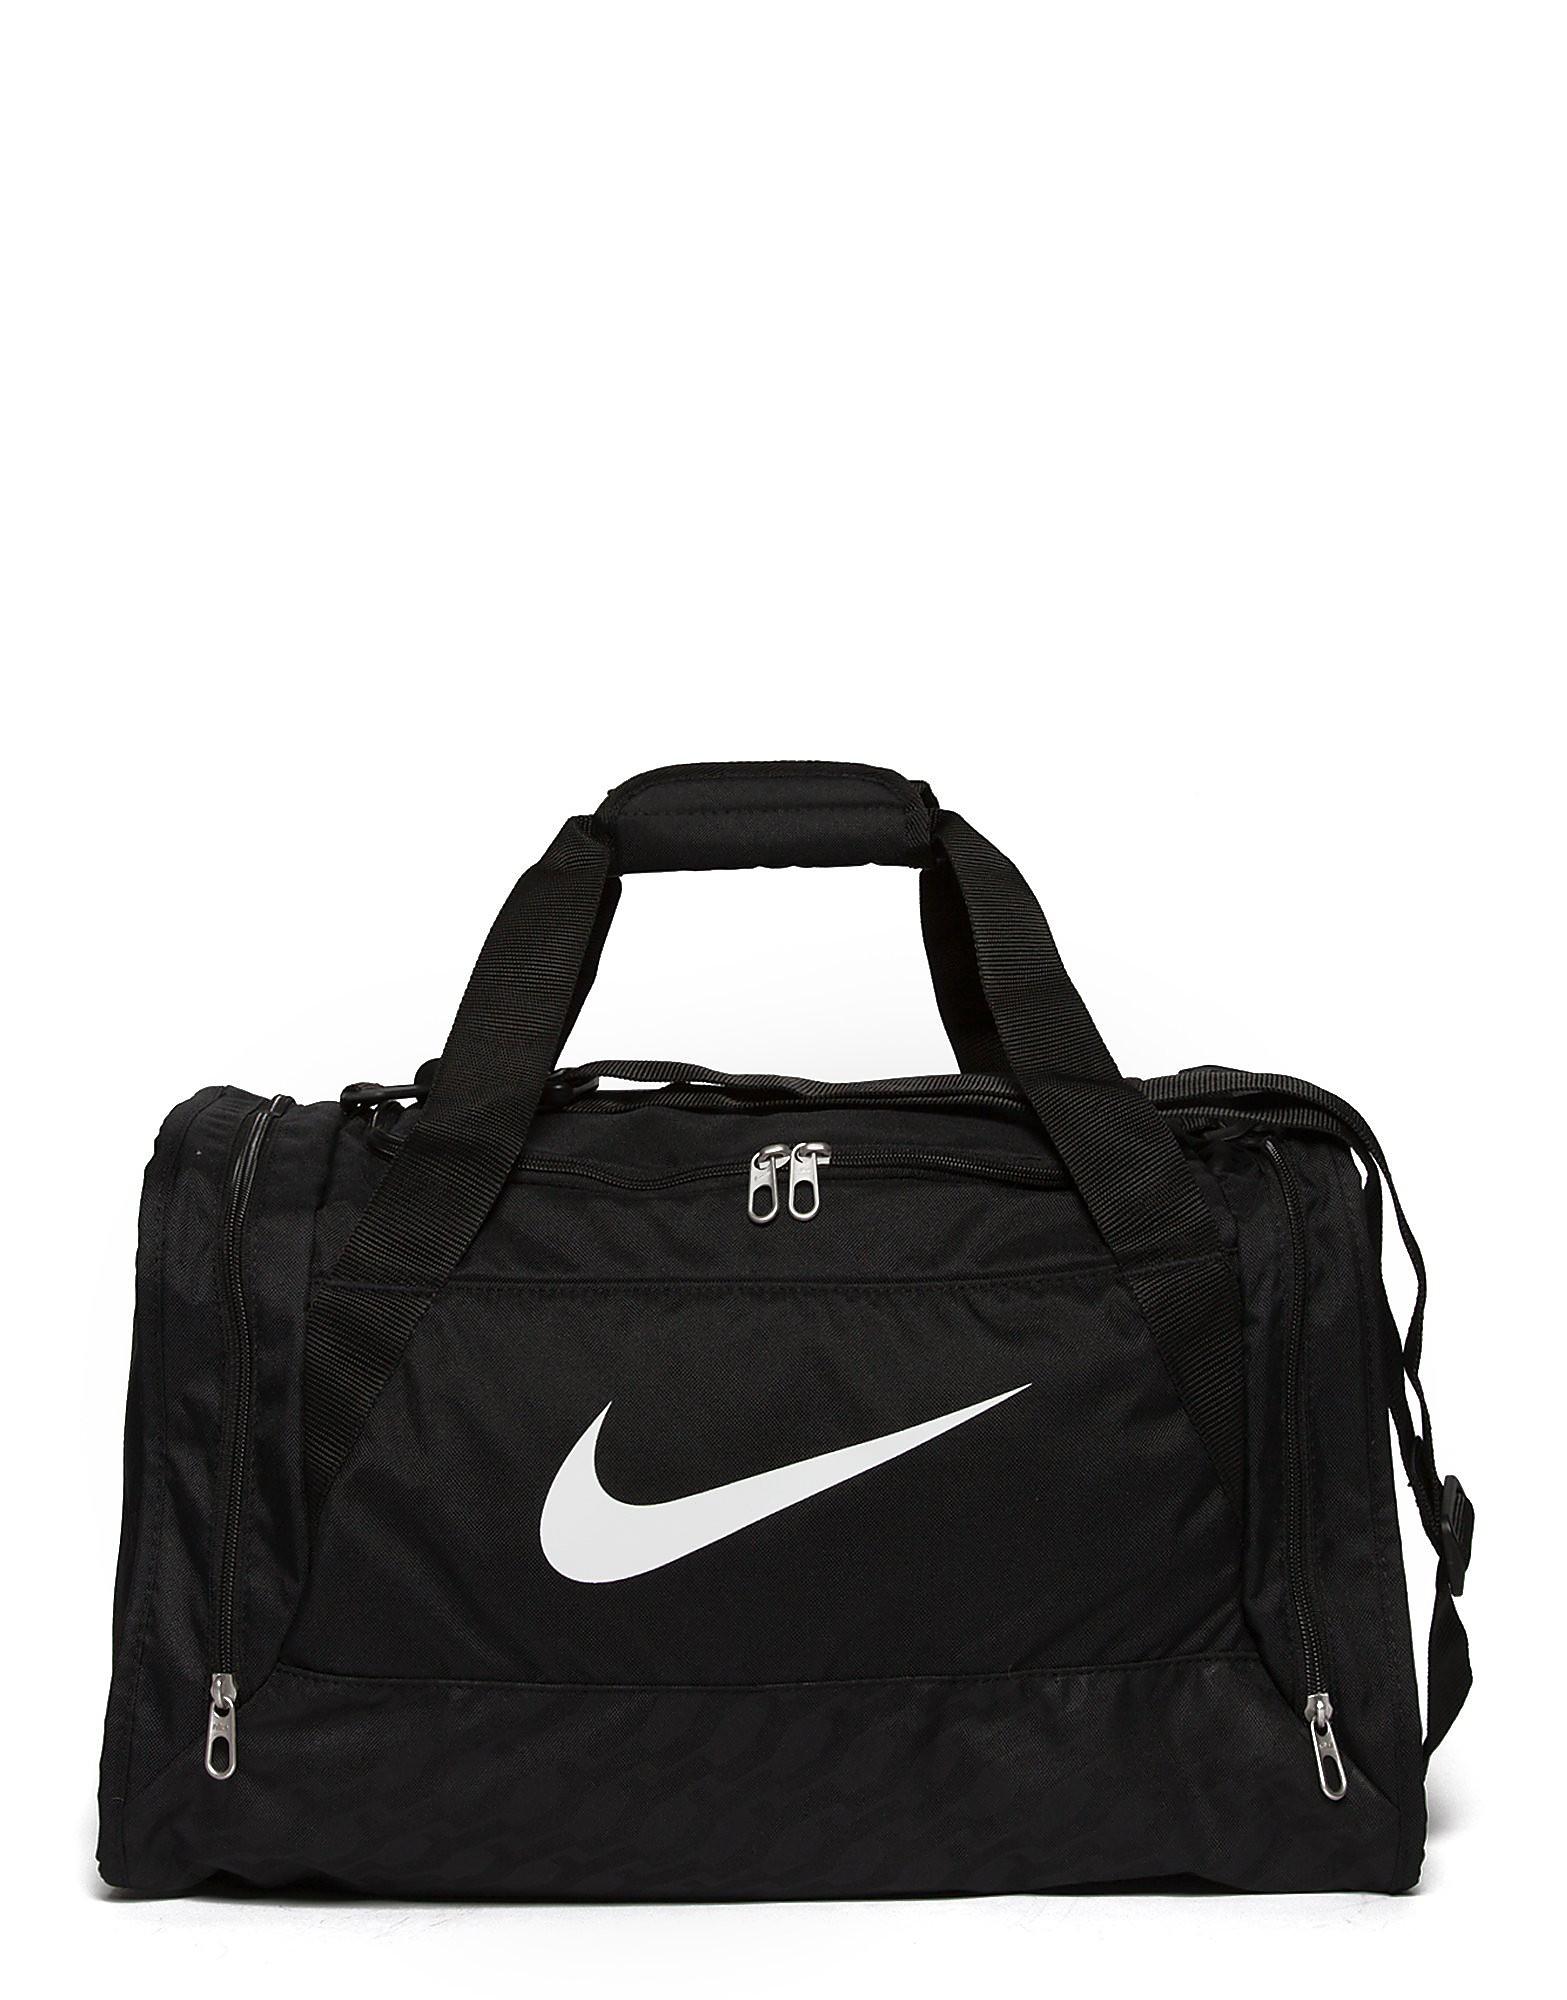 Nike Brasilia Small Duffle Bag - Black - Mens, Black